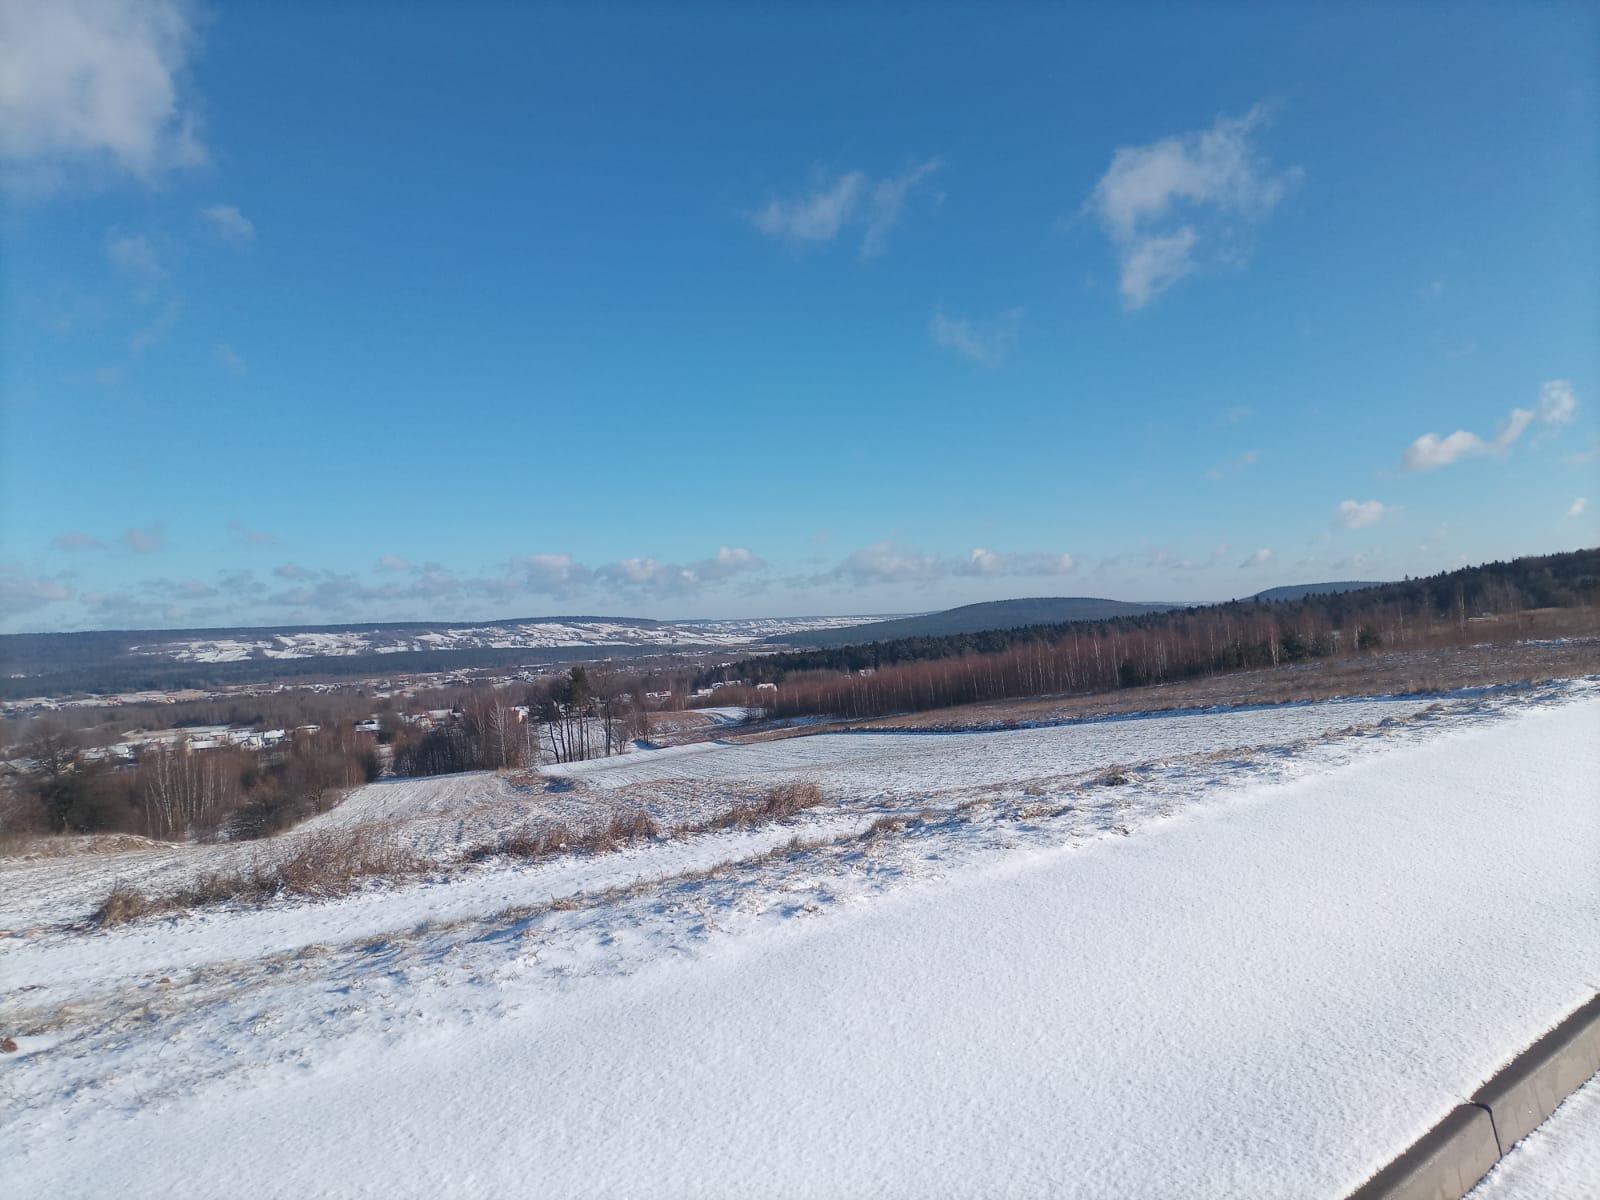 Piękne<br>Krajobrazy